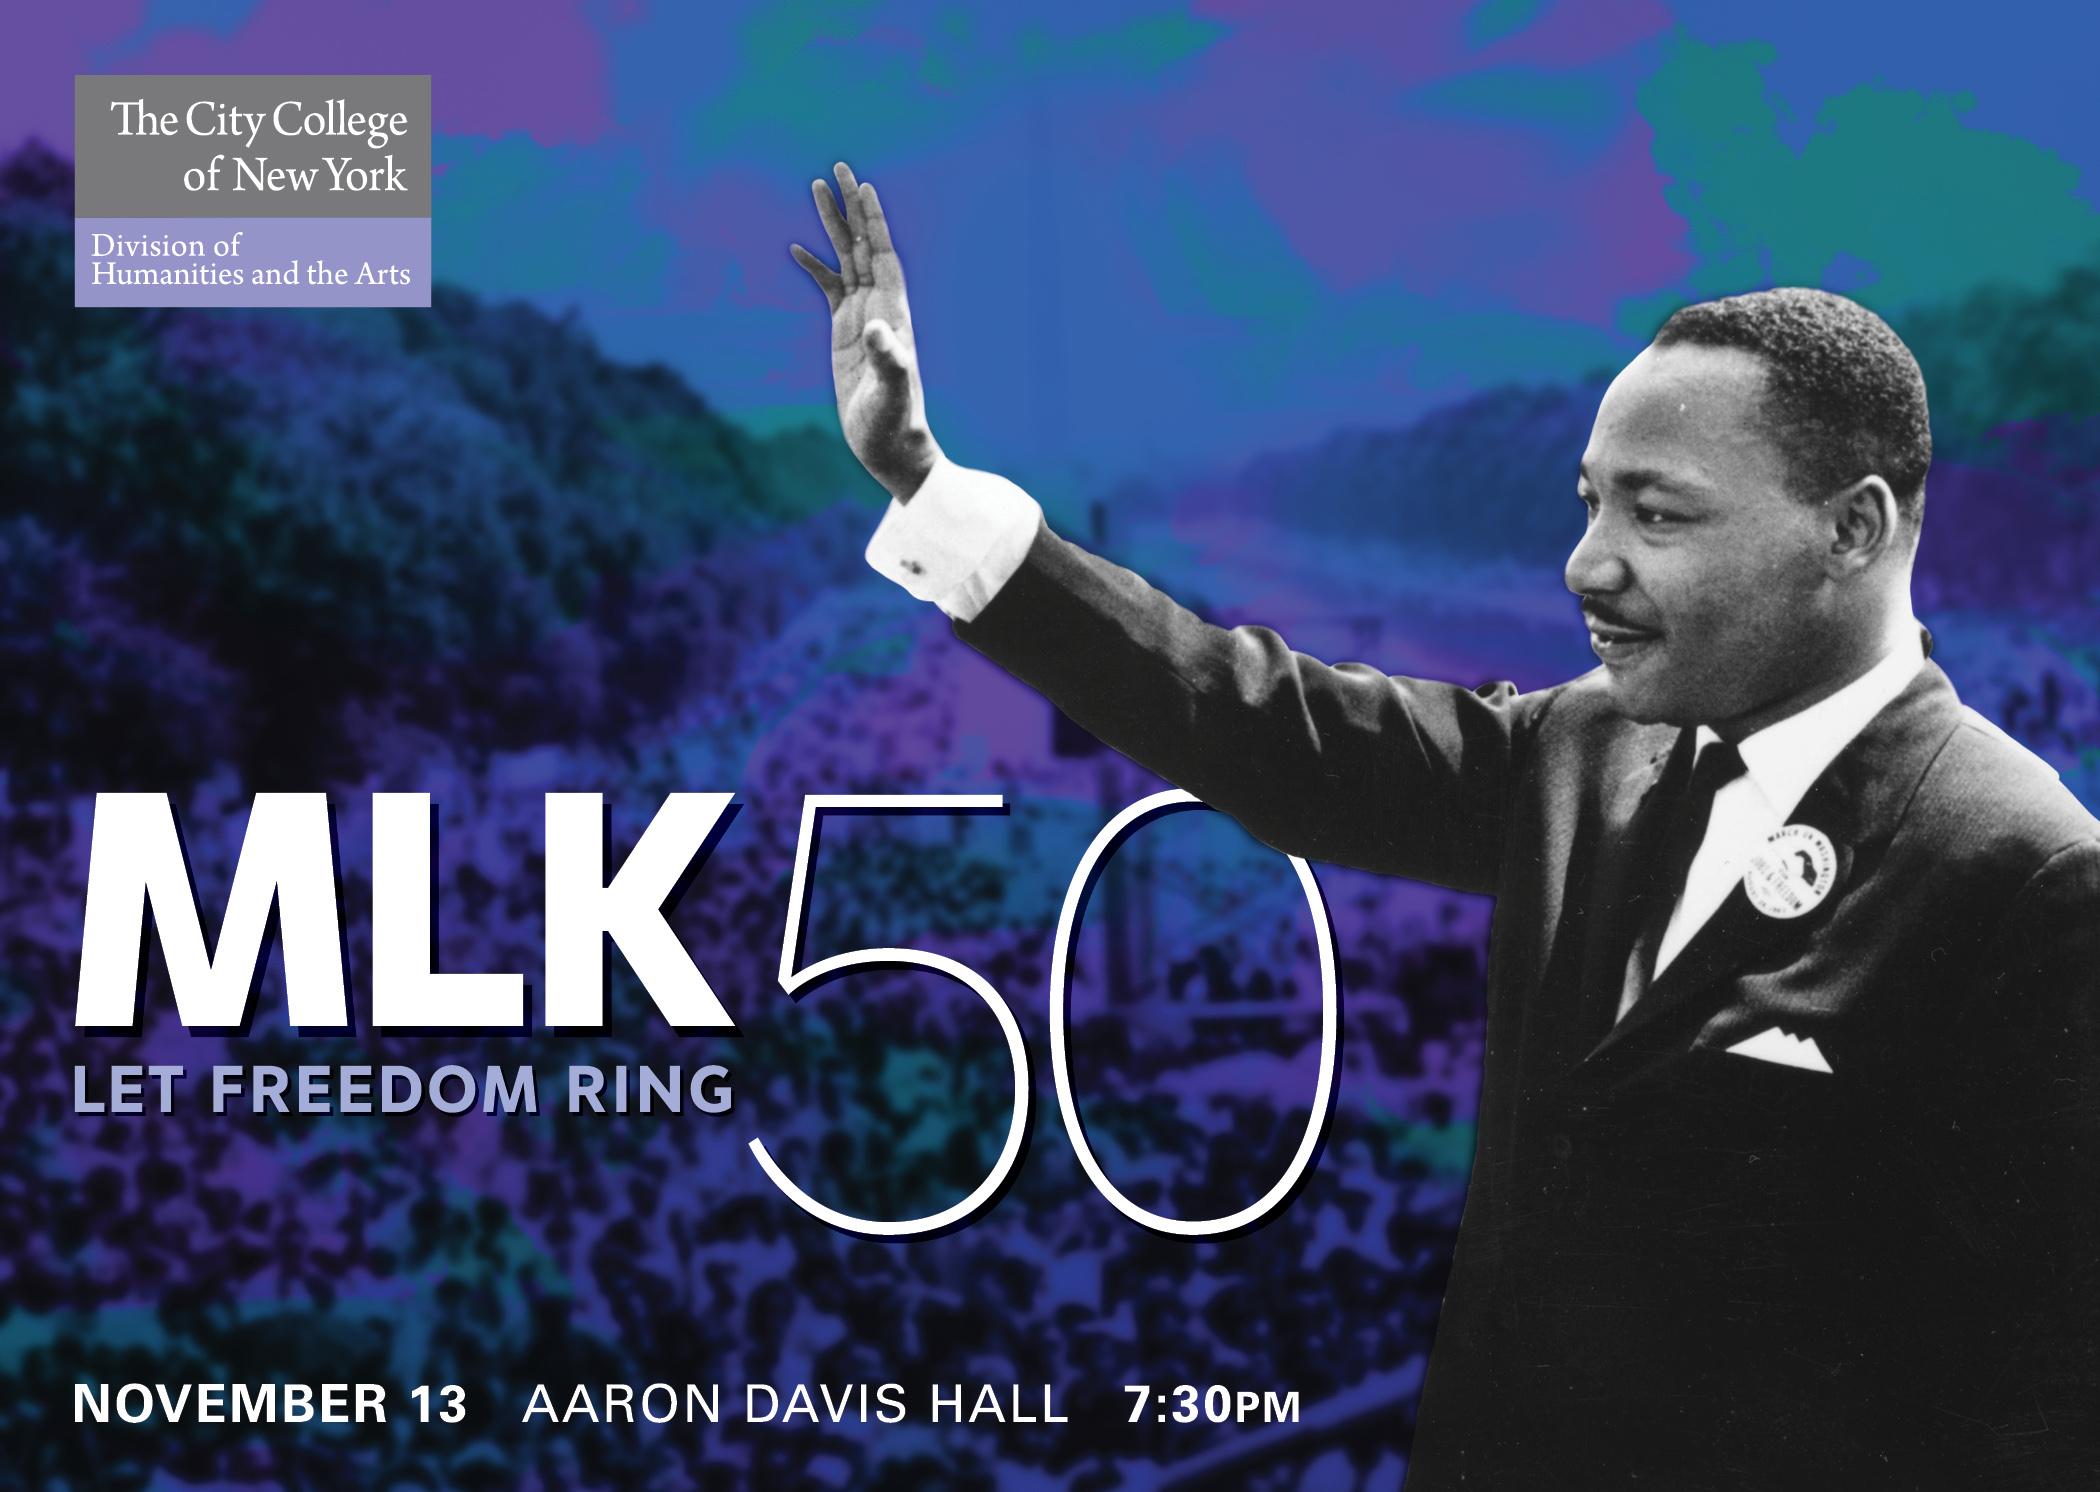 MLK50: Let Freedom Ring